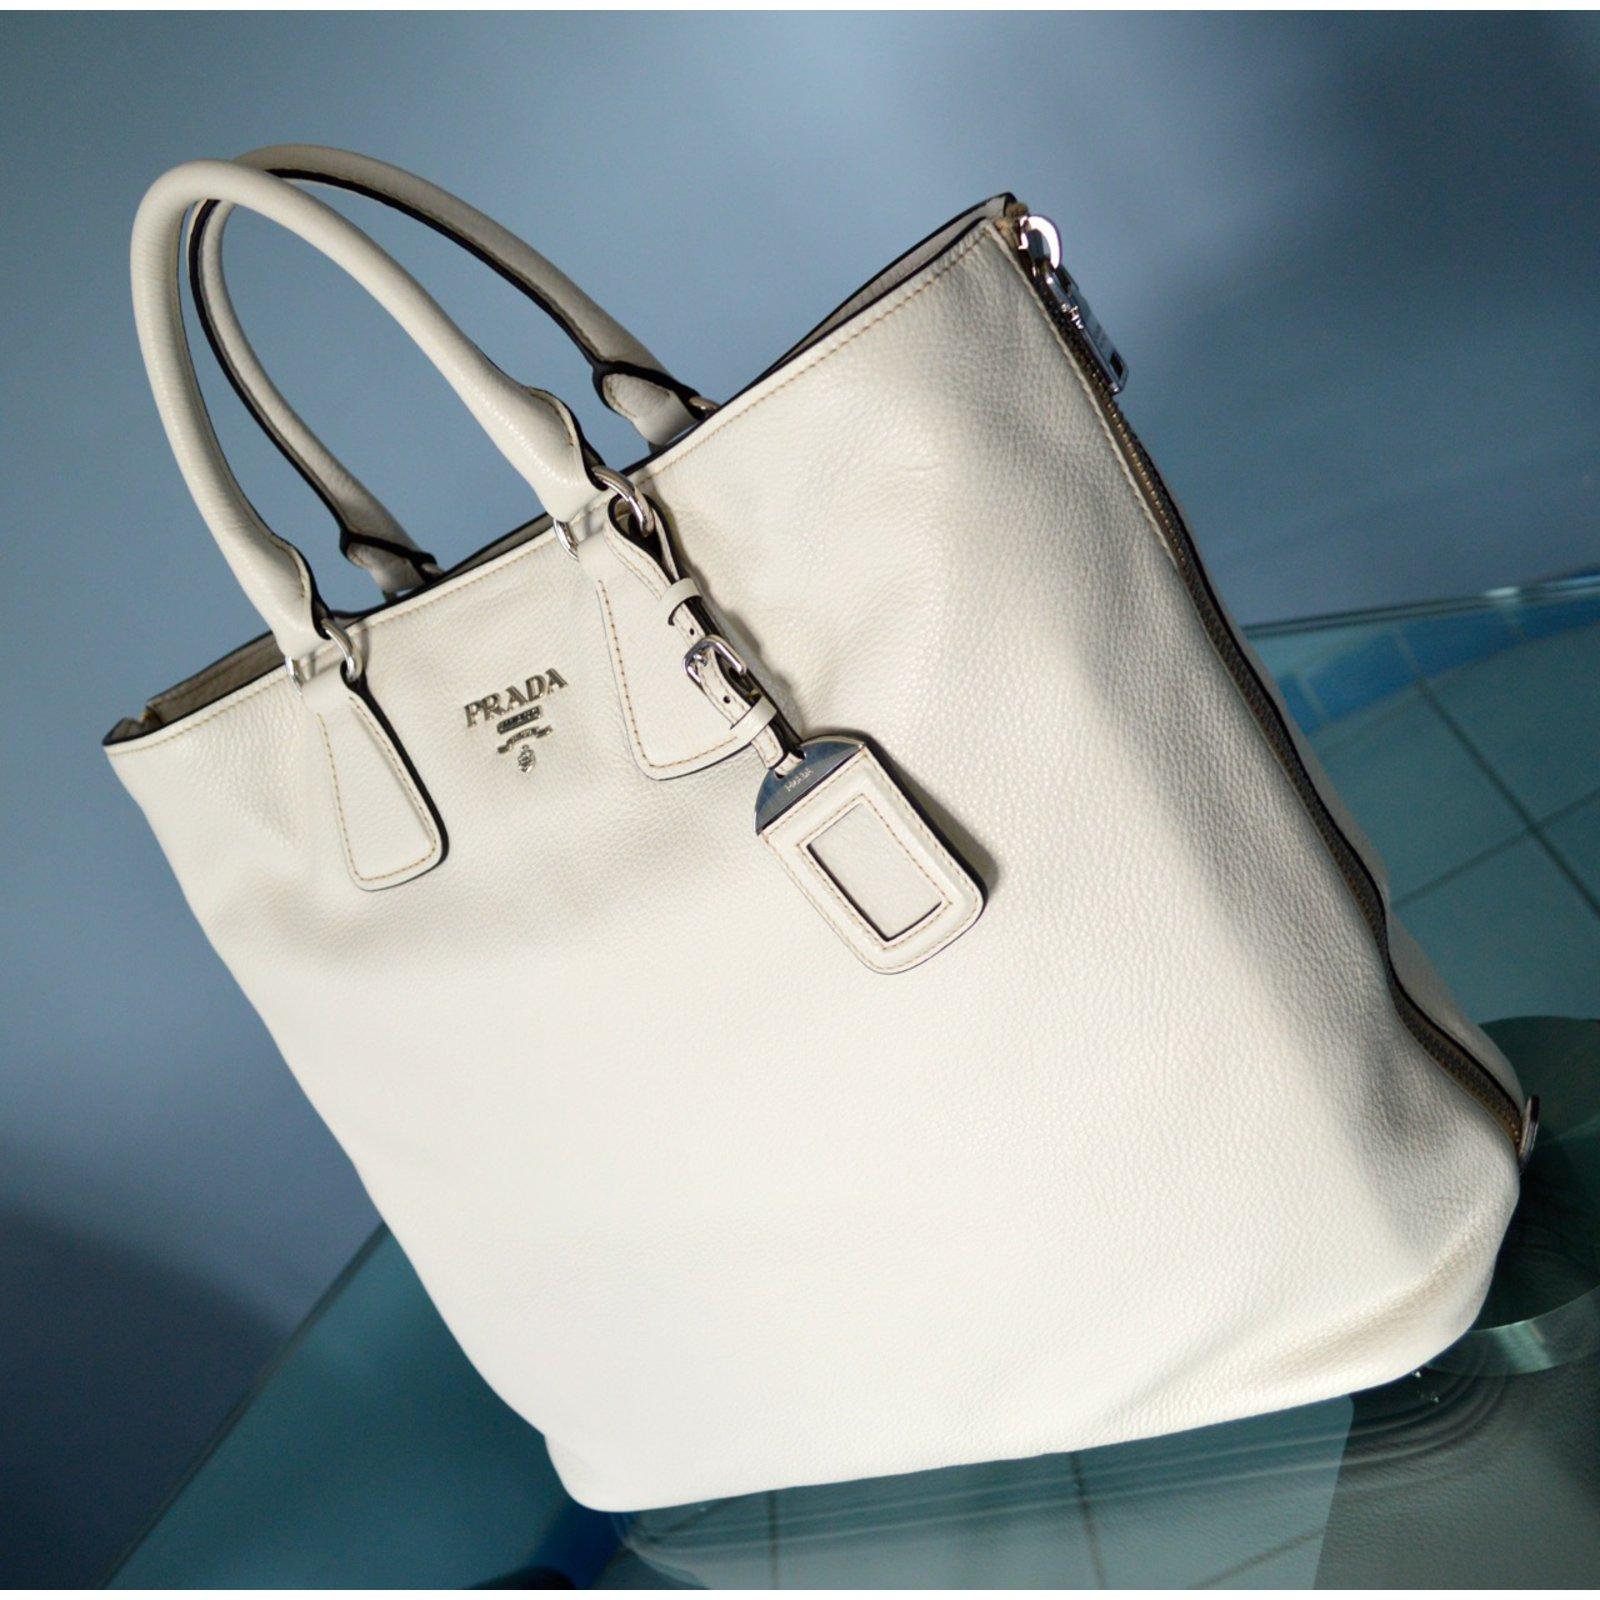 5c10542ef062 Prada Prada vitello phenix talco textured leather shopping tote bag bn2419  original Handbags Leather White ref.22022 - Joli Closet